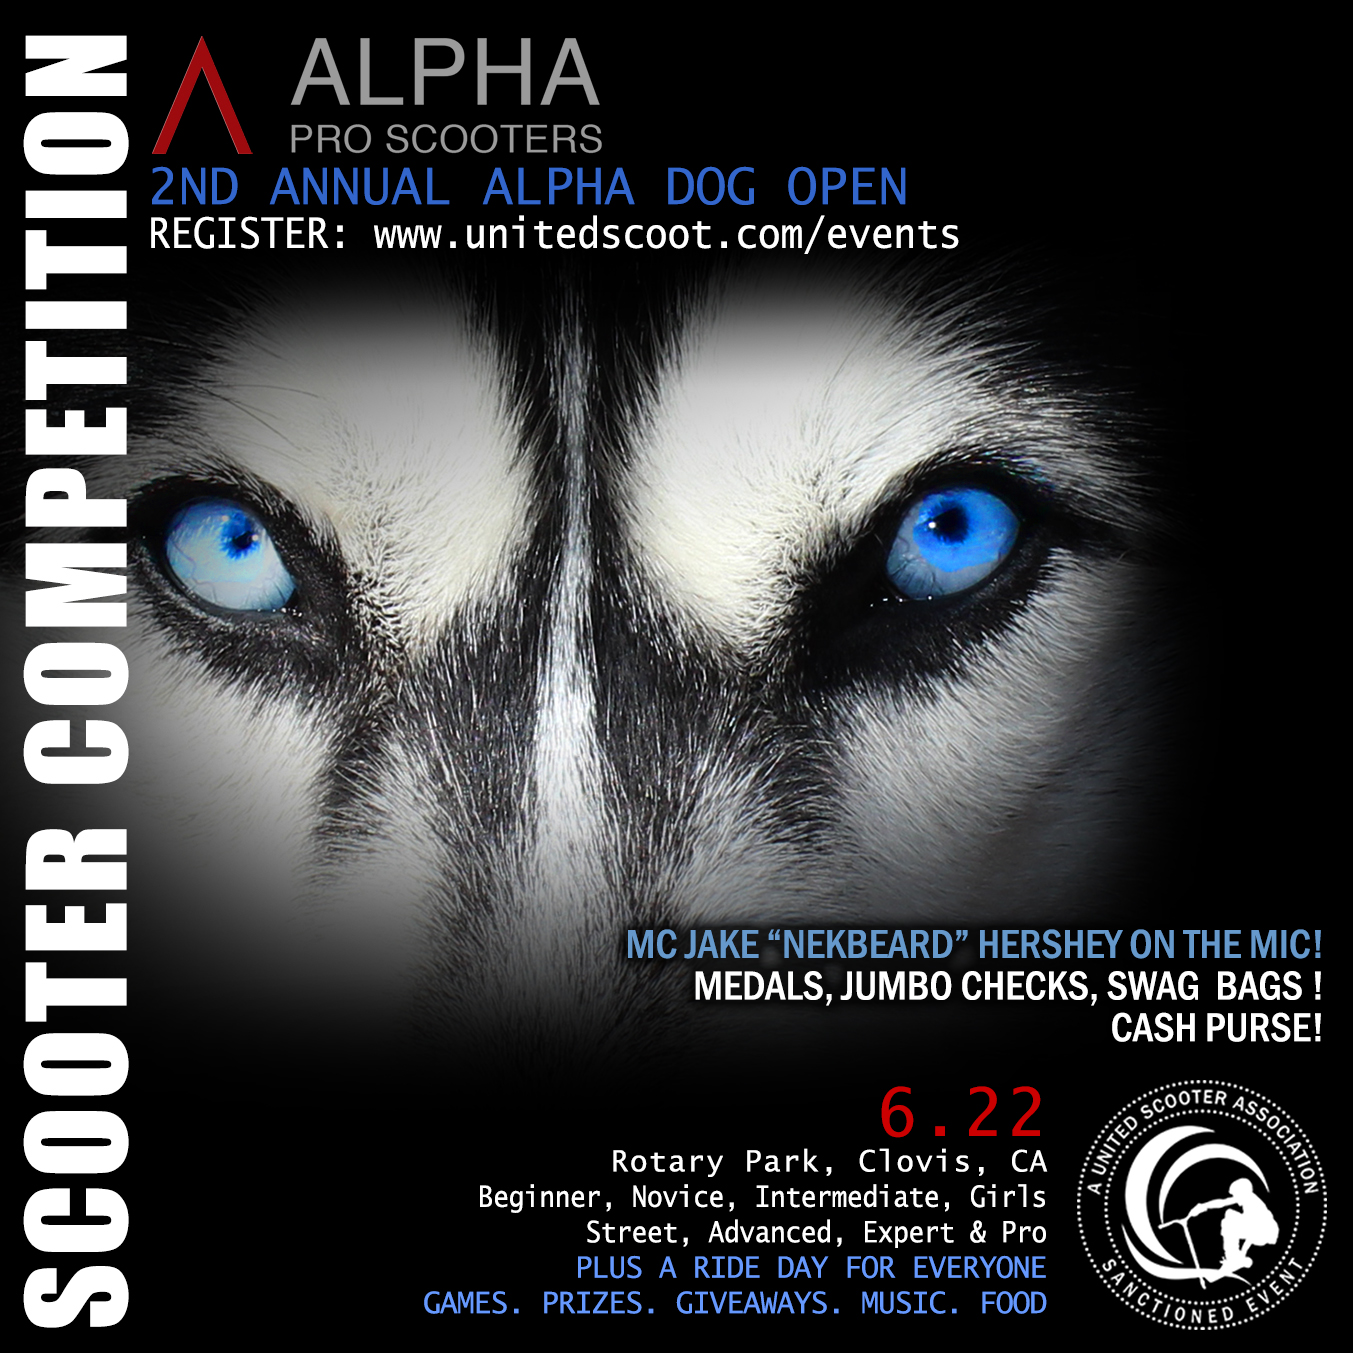 6/22/2019 - Alpha Dog II, Rotary Park, Clovis, CA (x1.5pts)